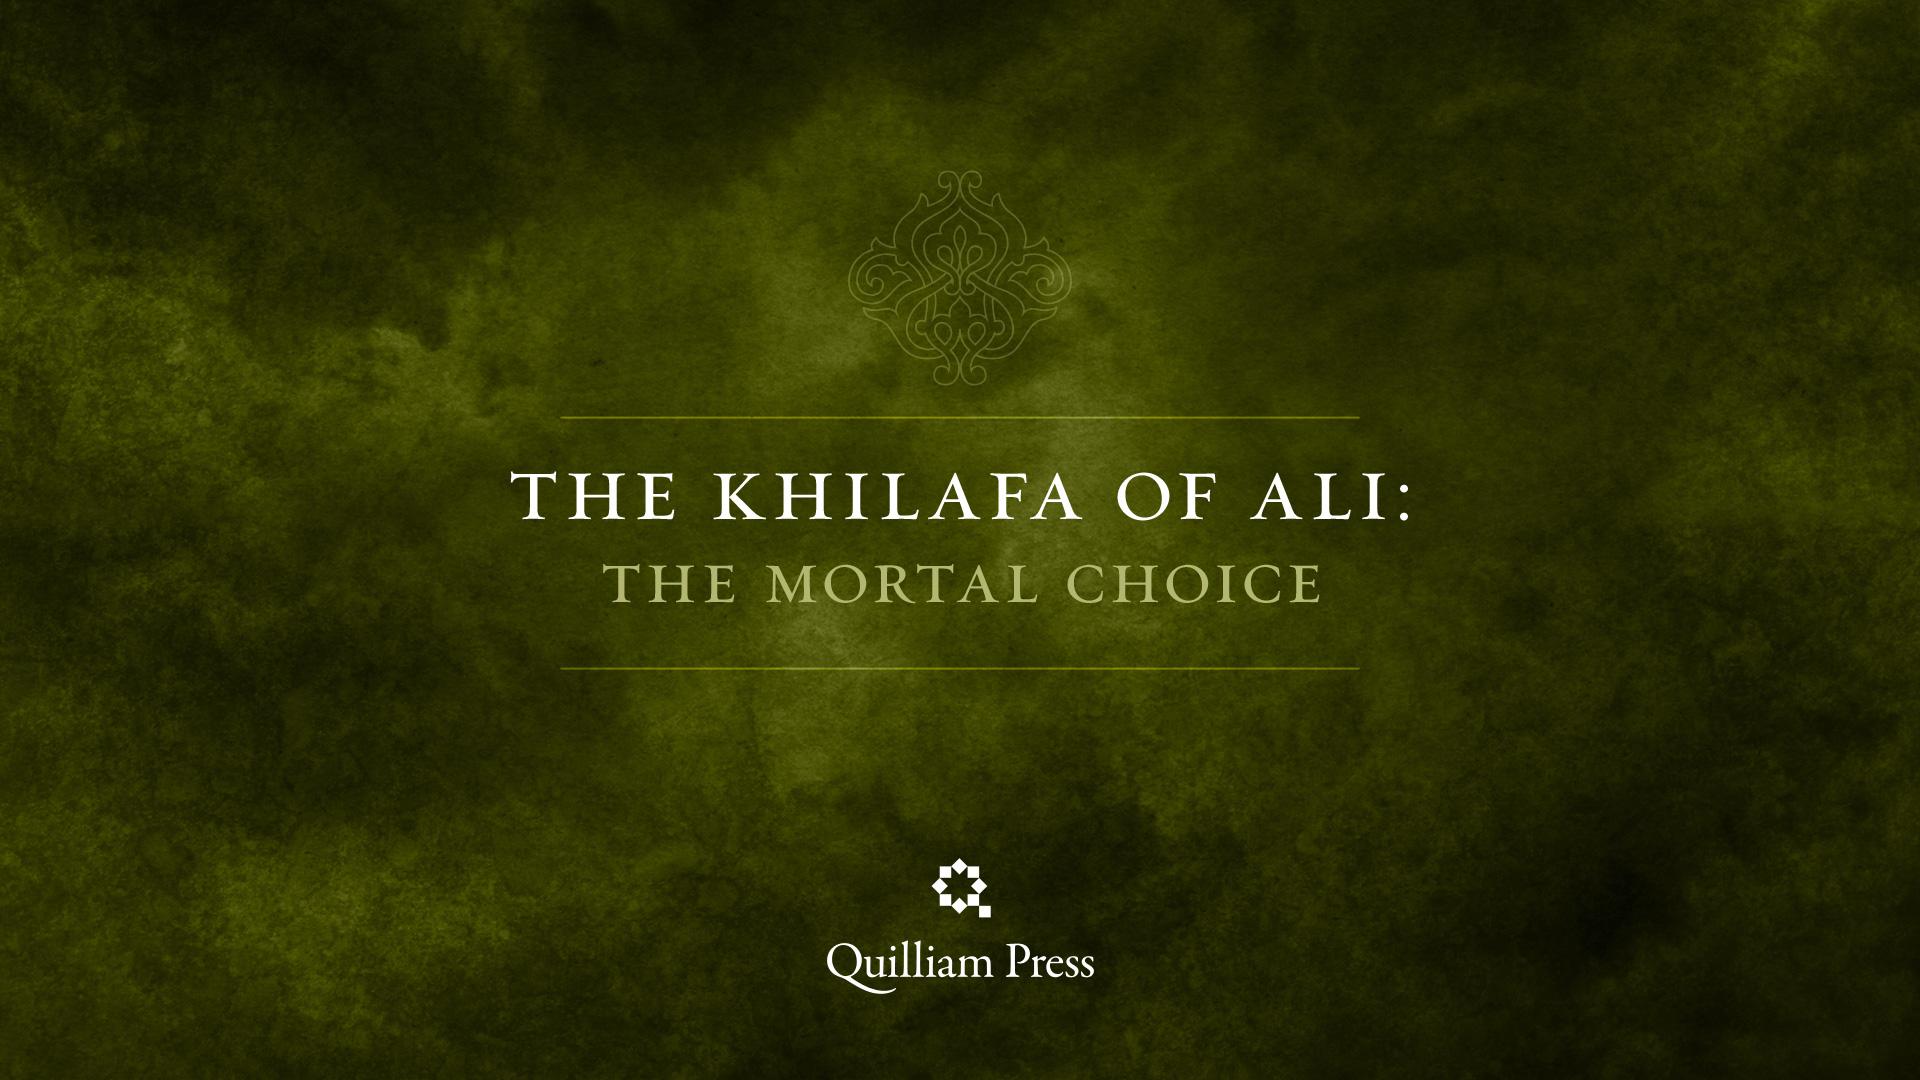 Quilliam_Press_Khilafa_Series_04.jpg